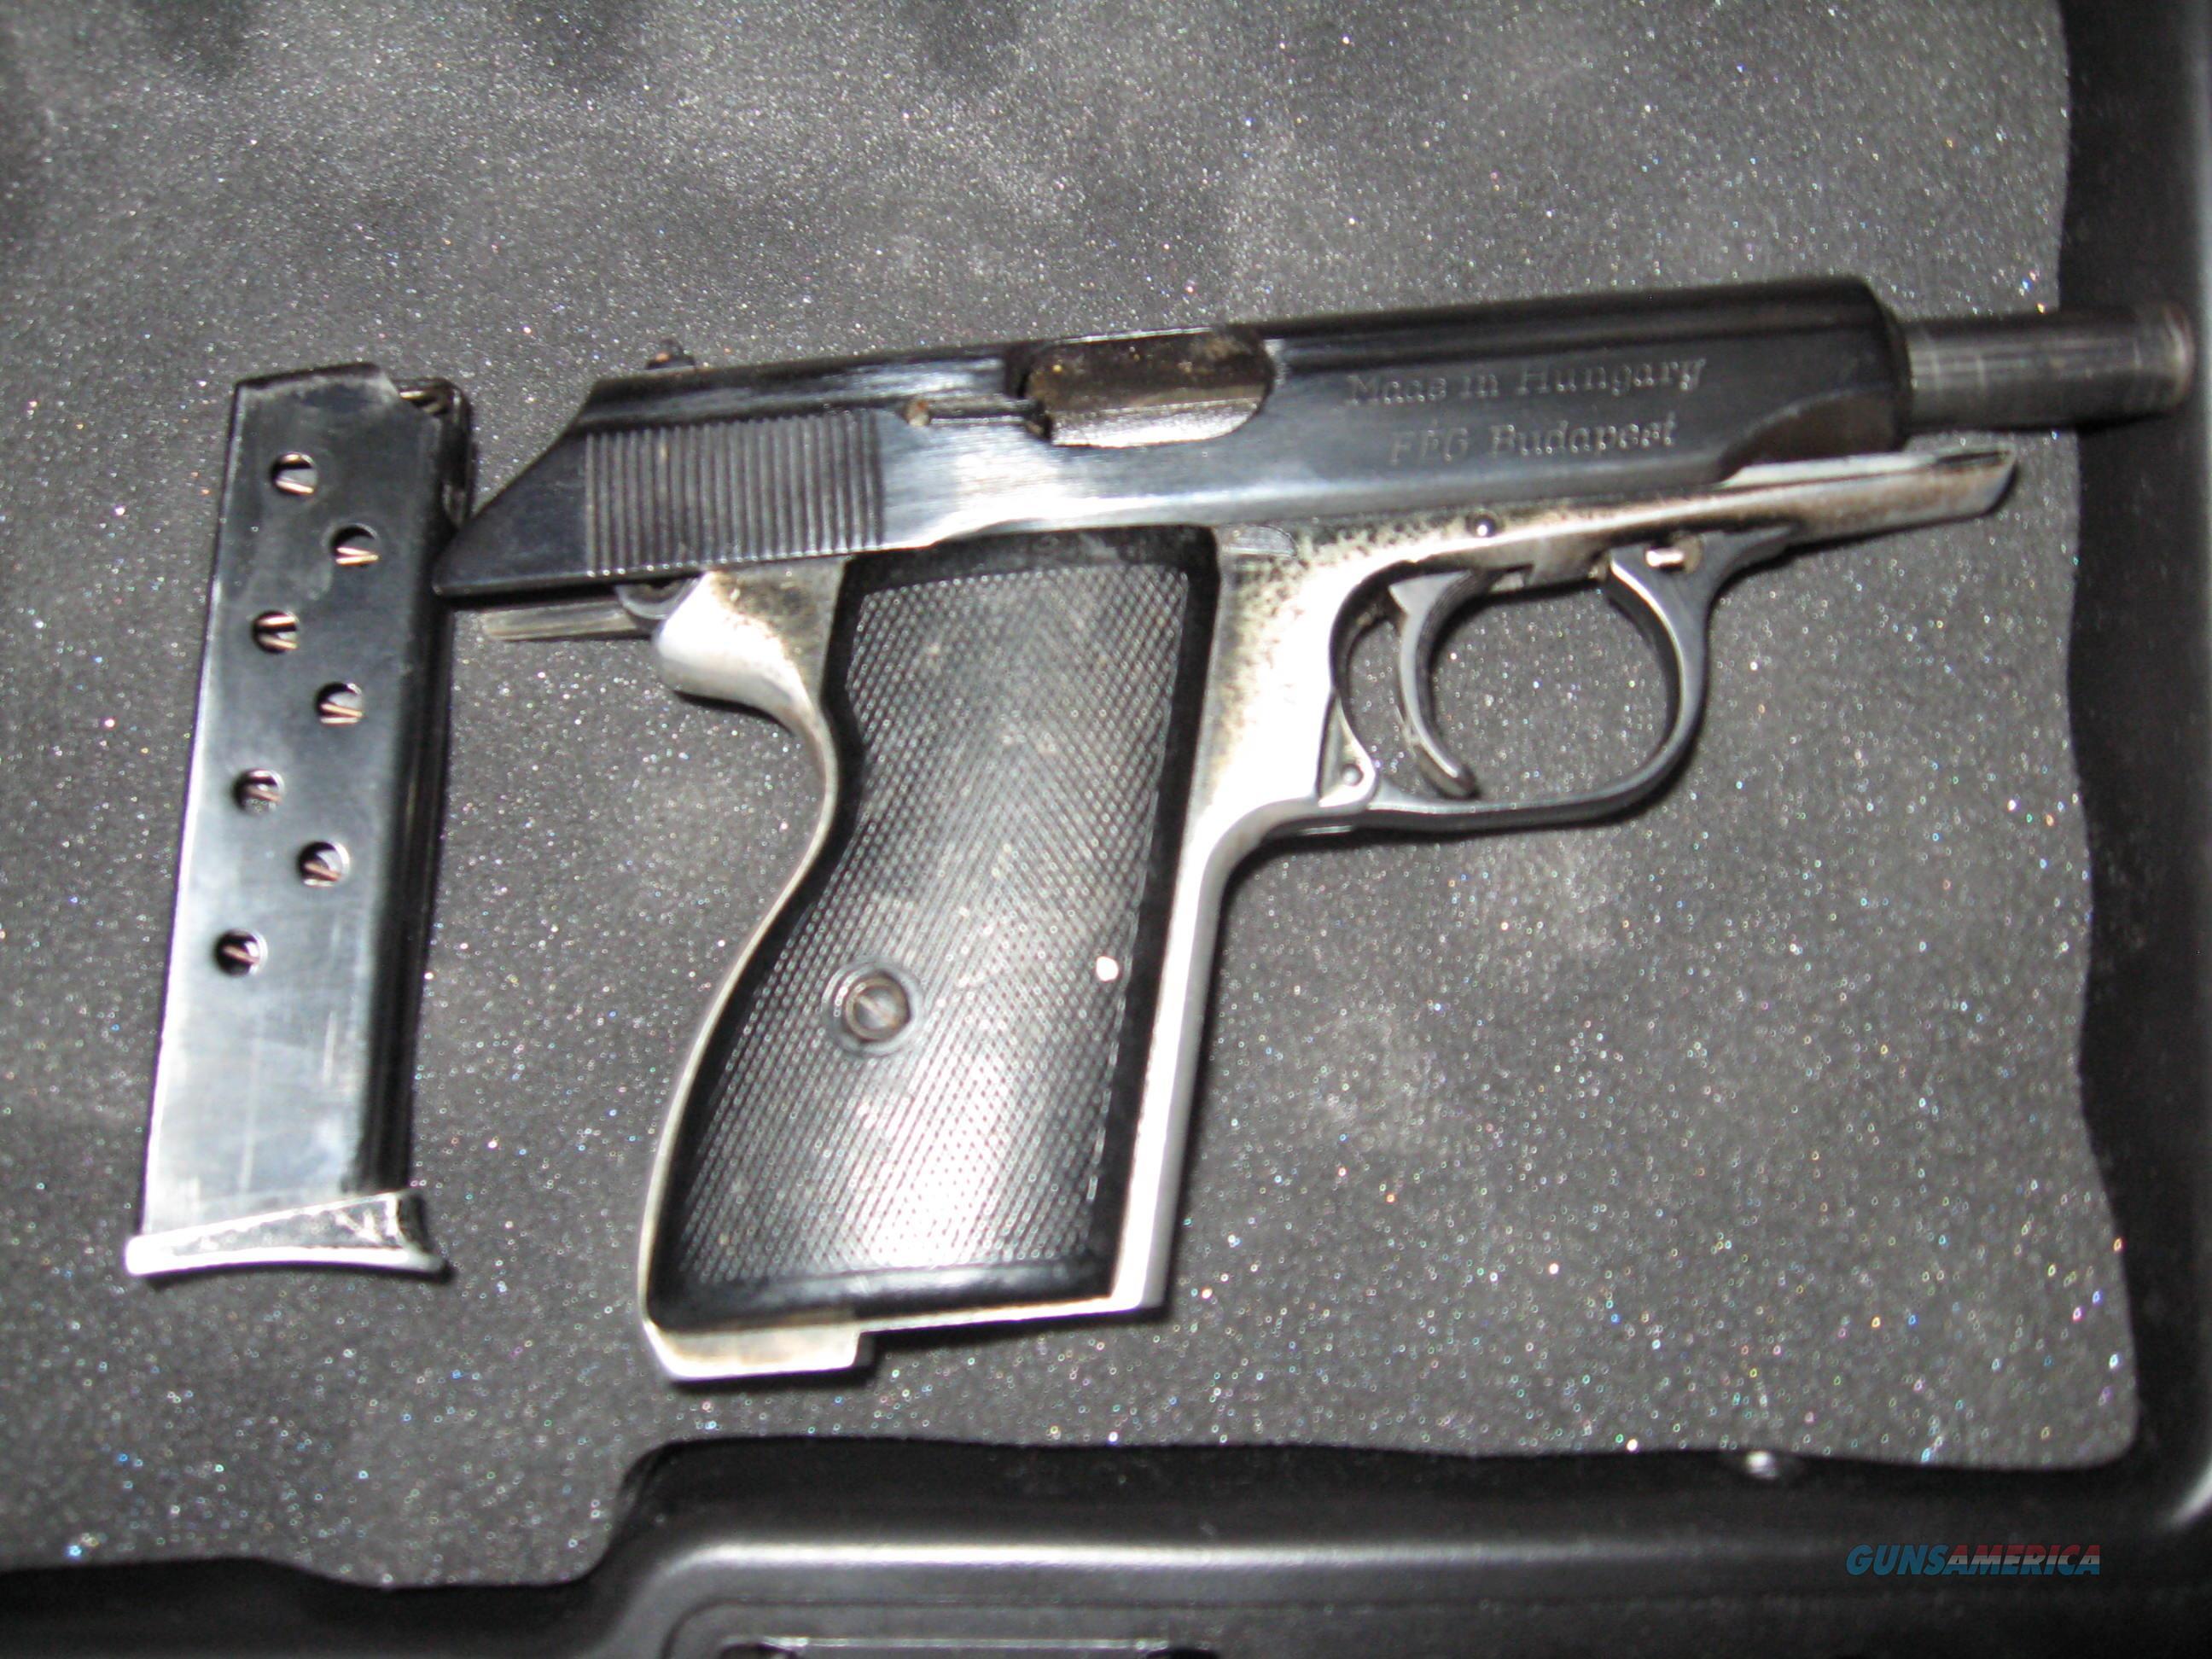 FEG AP-MBP pistol, 32ACP (7.65mm) caliber, used  Guns > Pistols > FEG Pistols